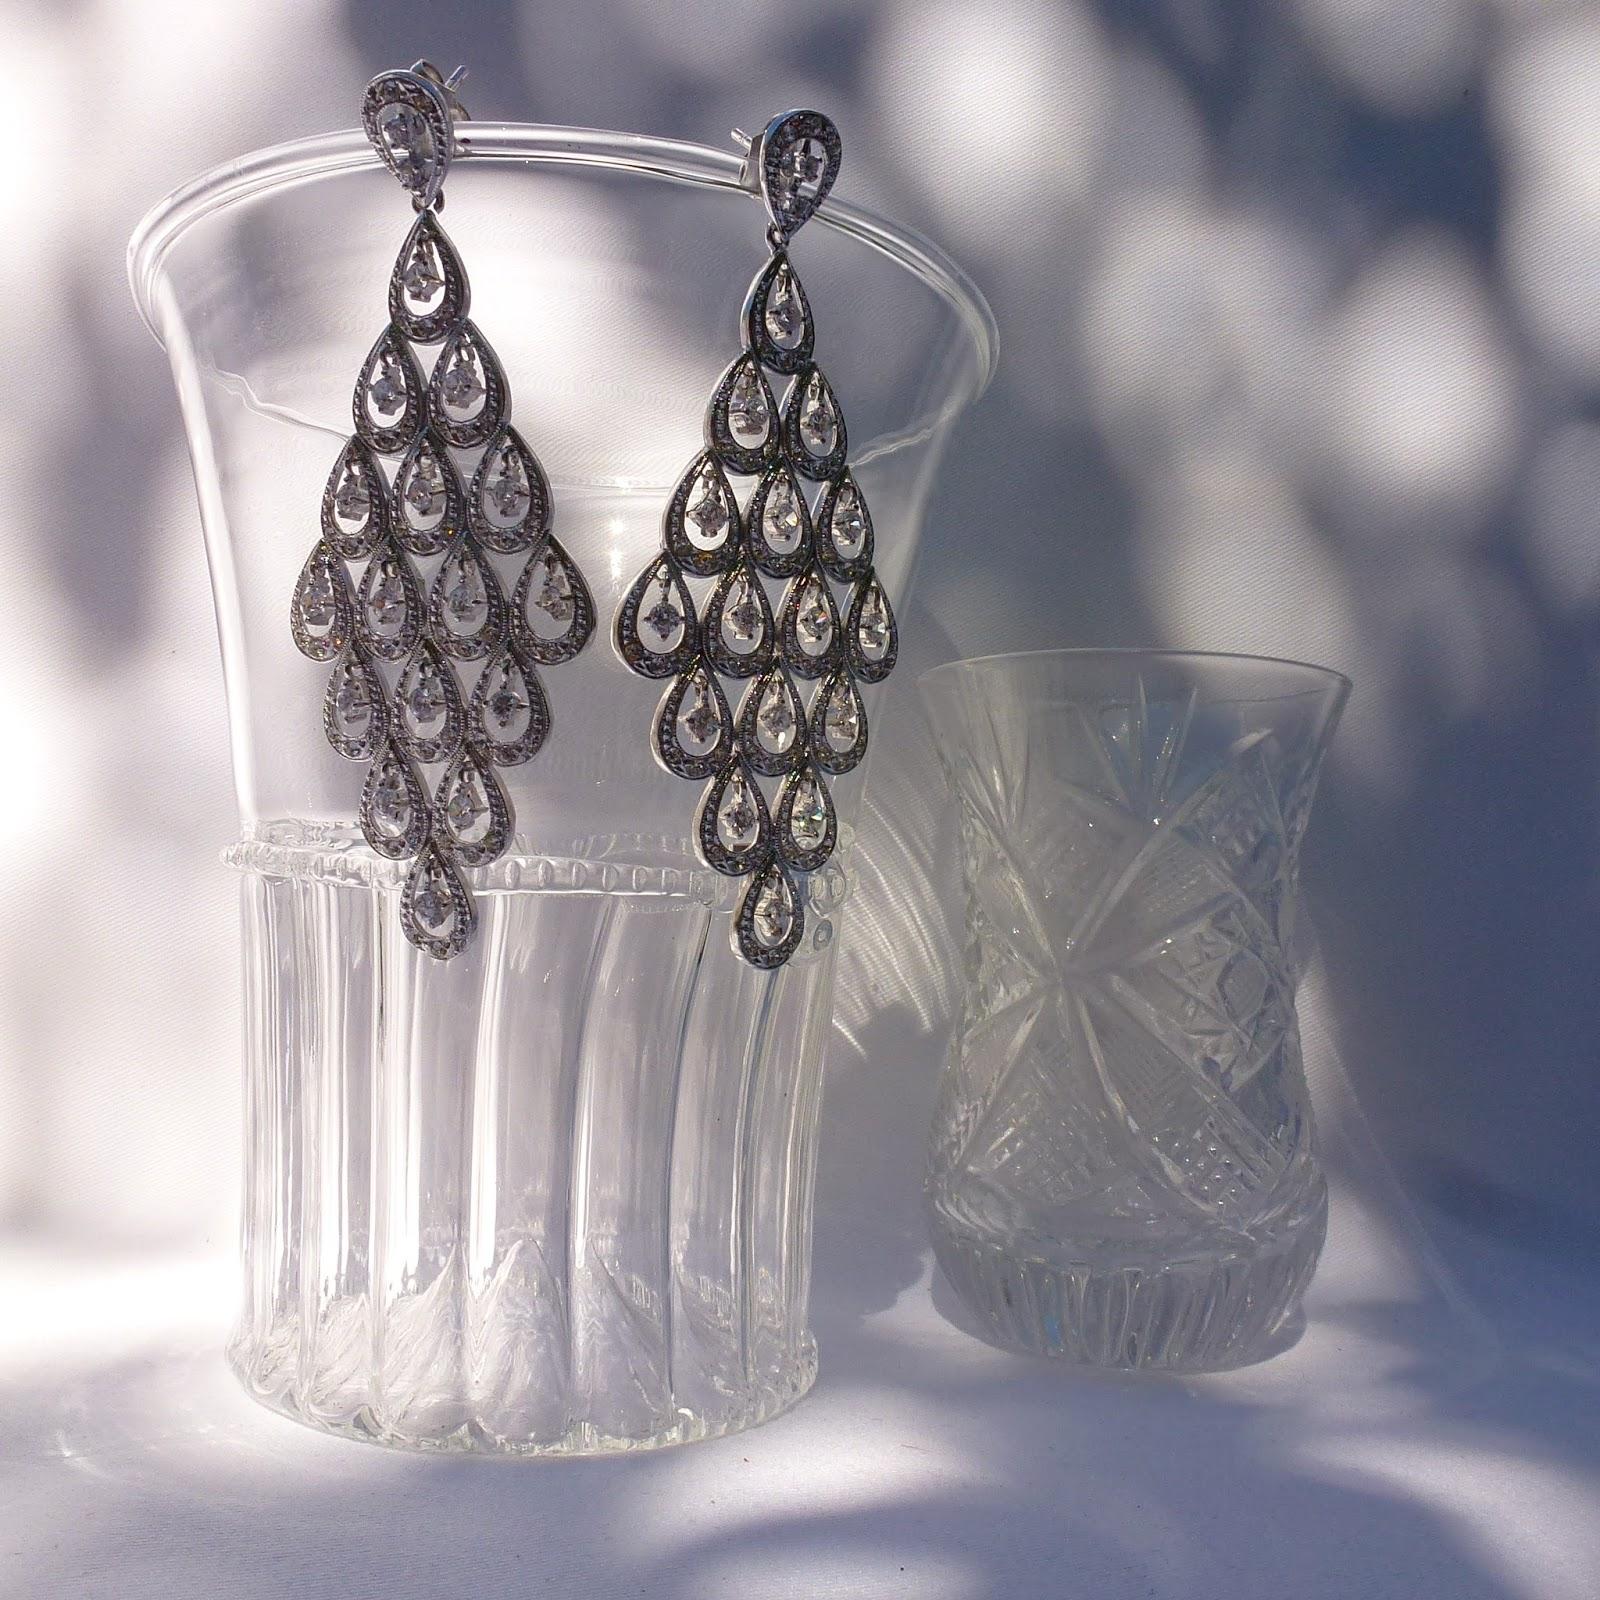 f2113cf9786b Complementos para un look color plata   how to accessorize a silver ...